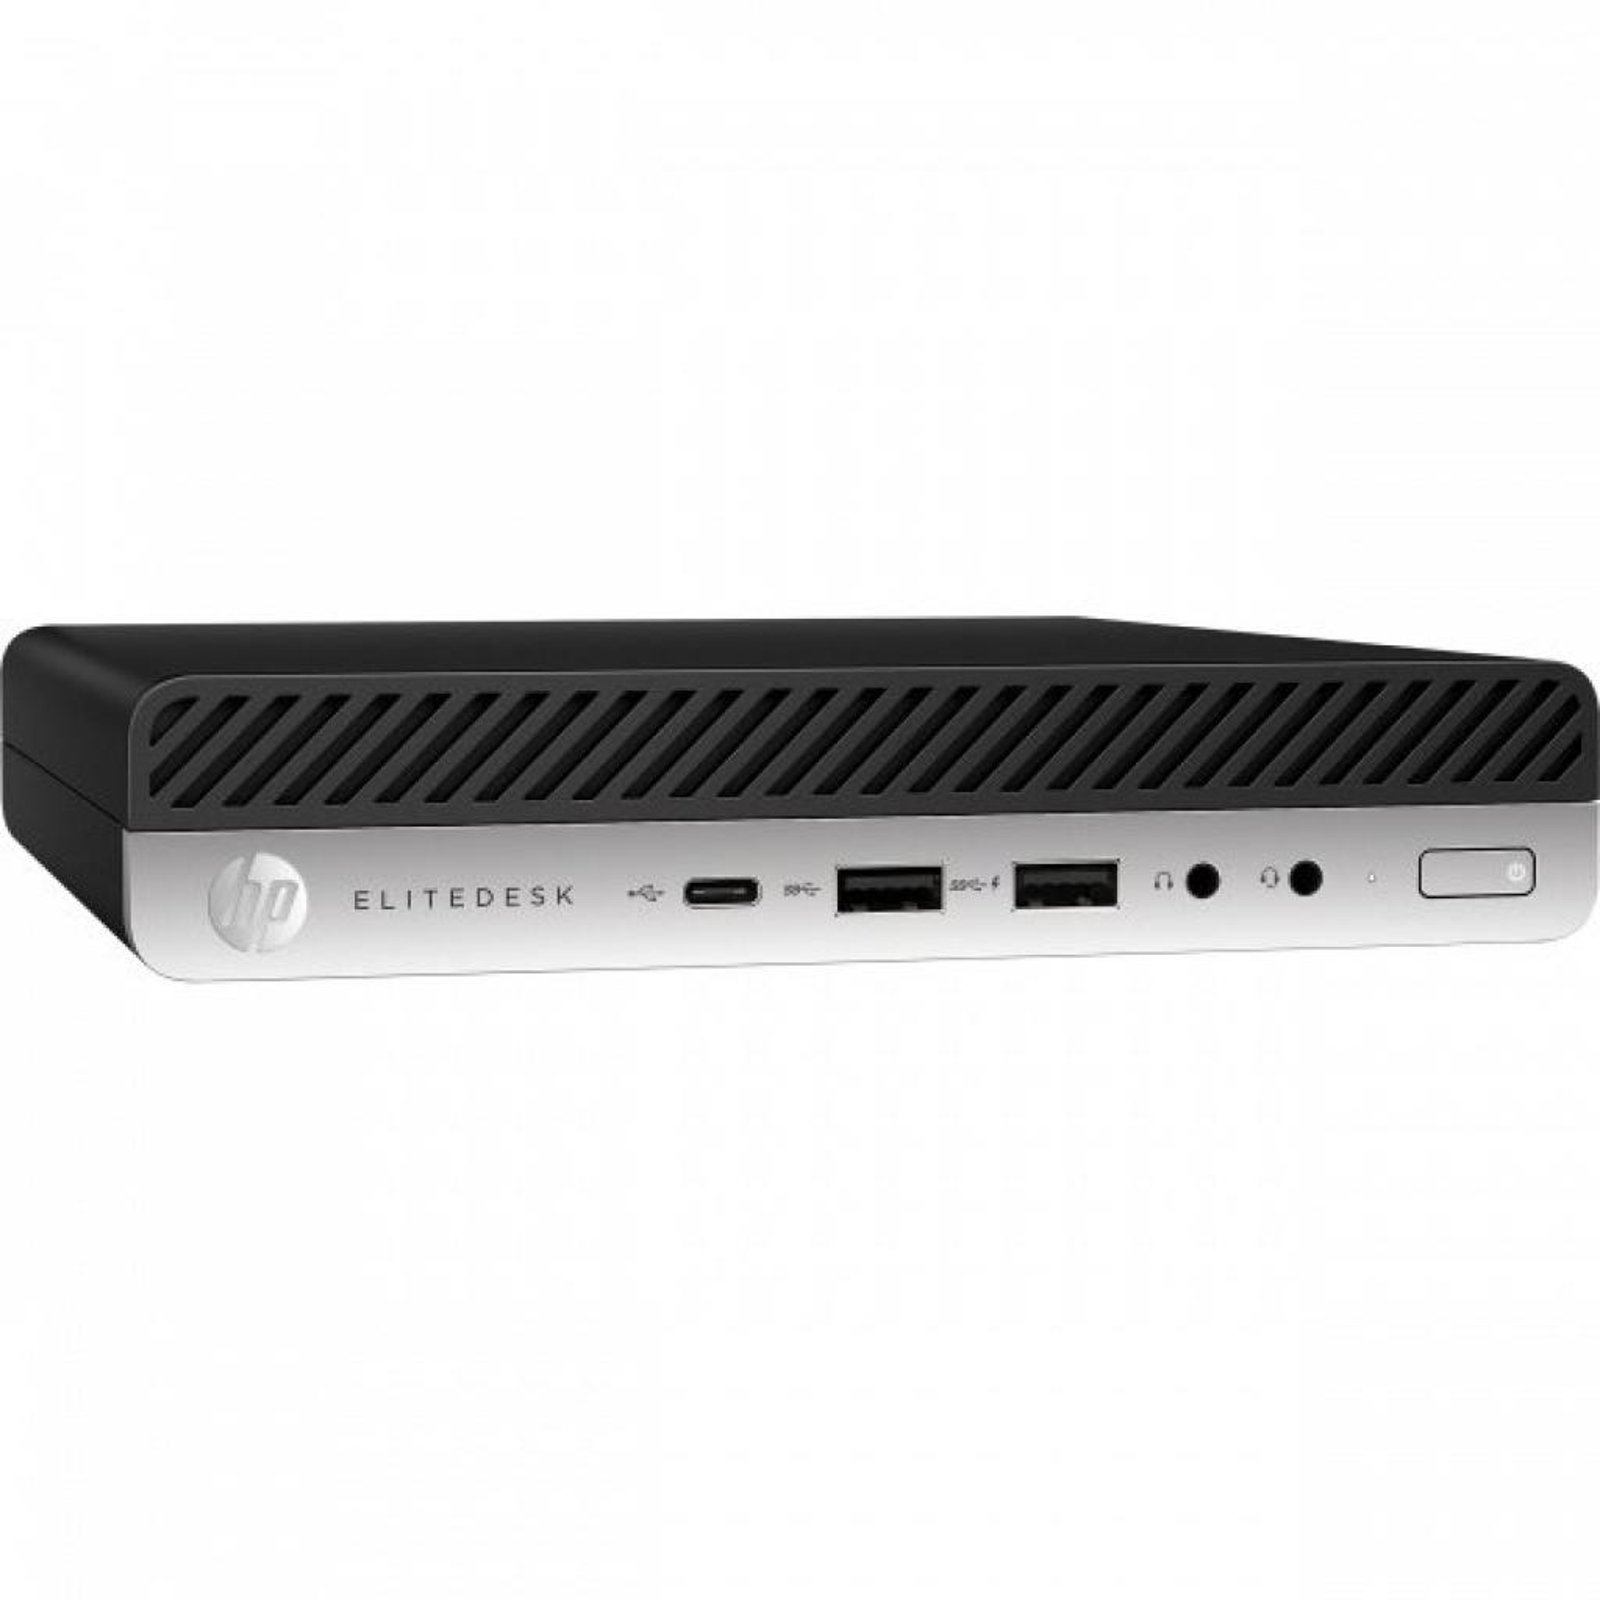 Комп'ютер HP EliteDesk 800 G5 DM / i7-9700T (7PF43EA) зображення 2